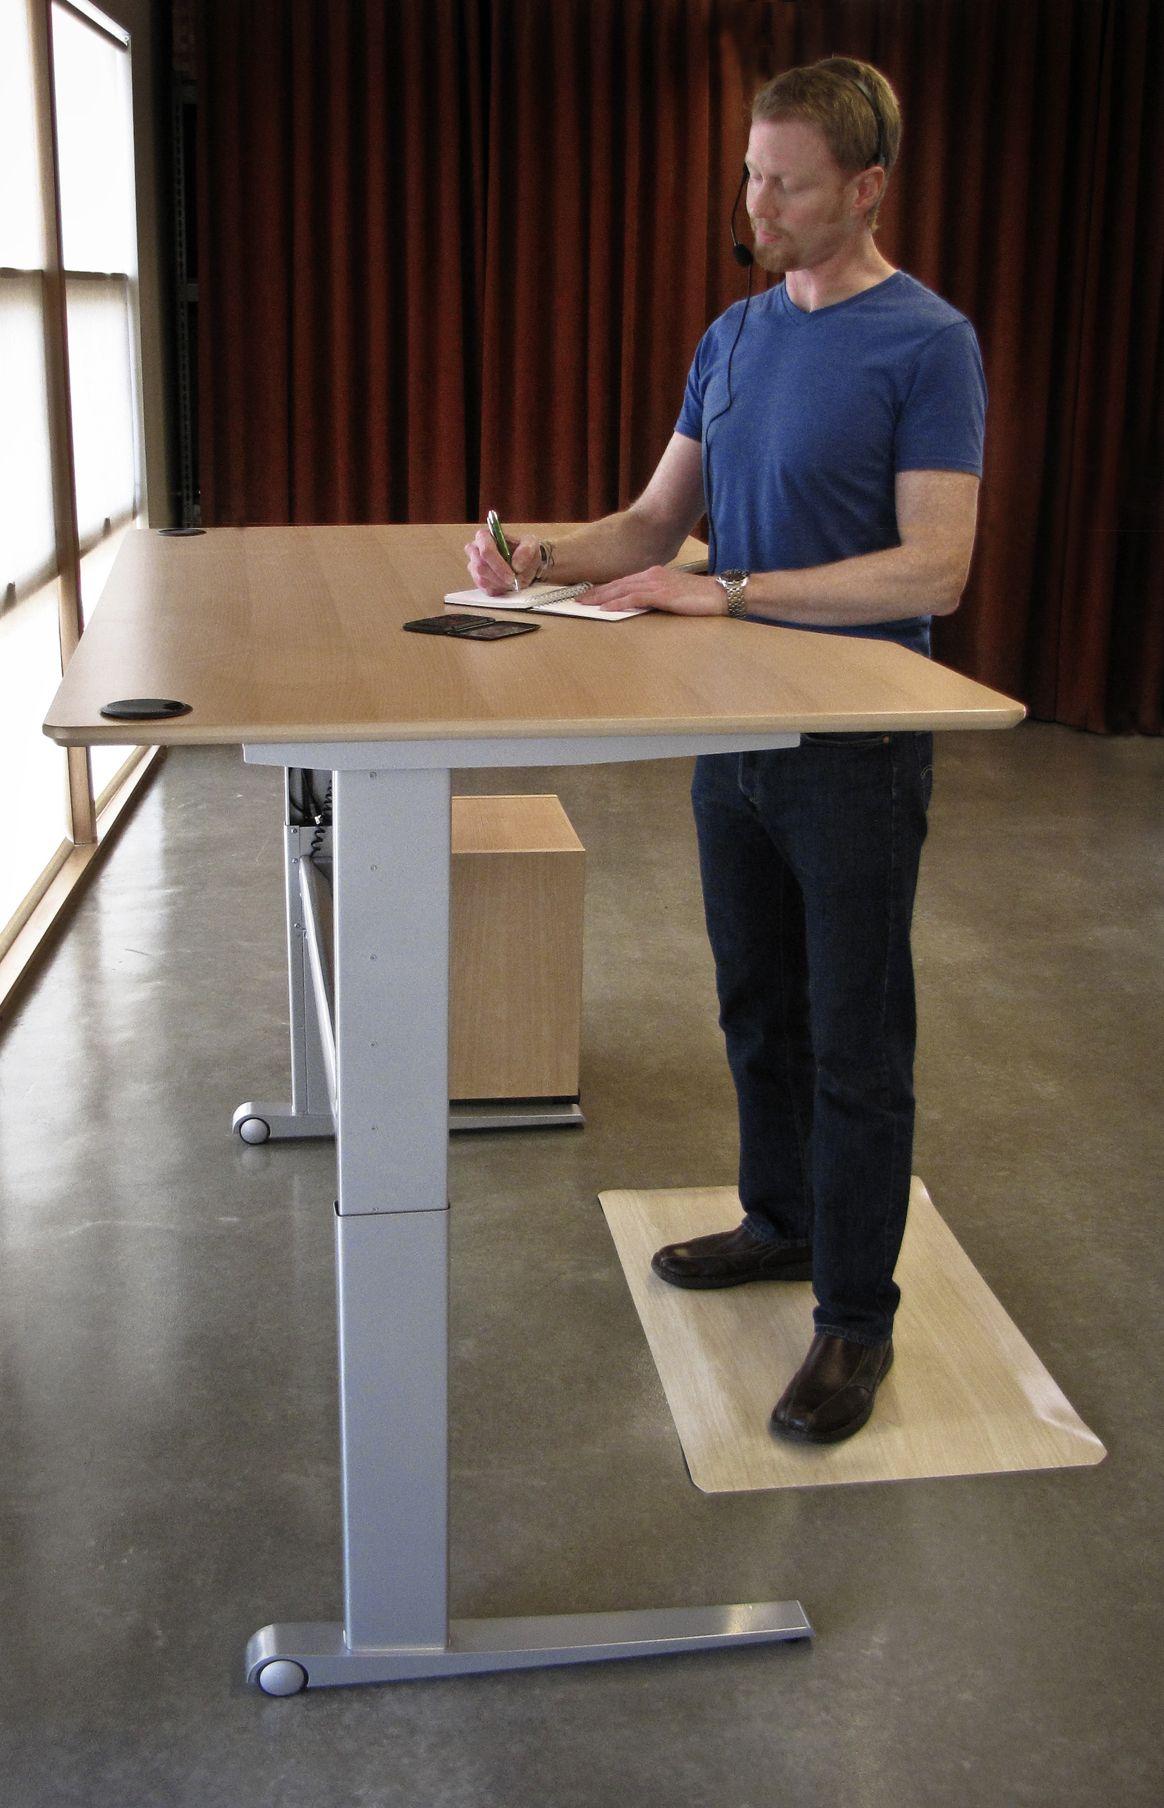 Ergo Depot AD117 Adjustable Height Desk AD117